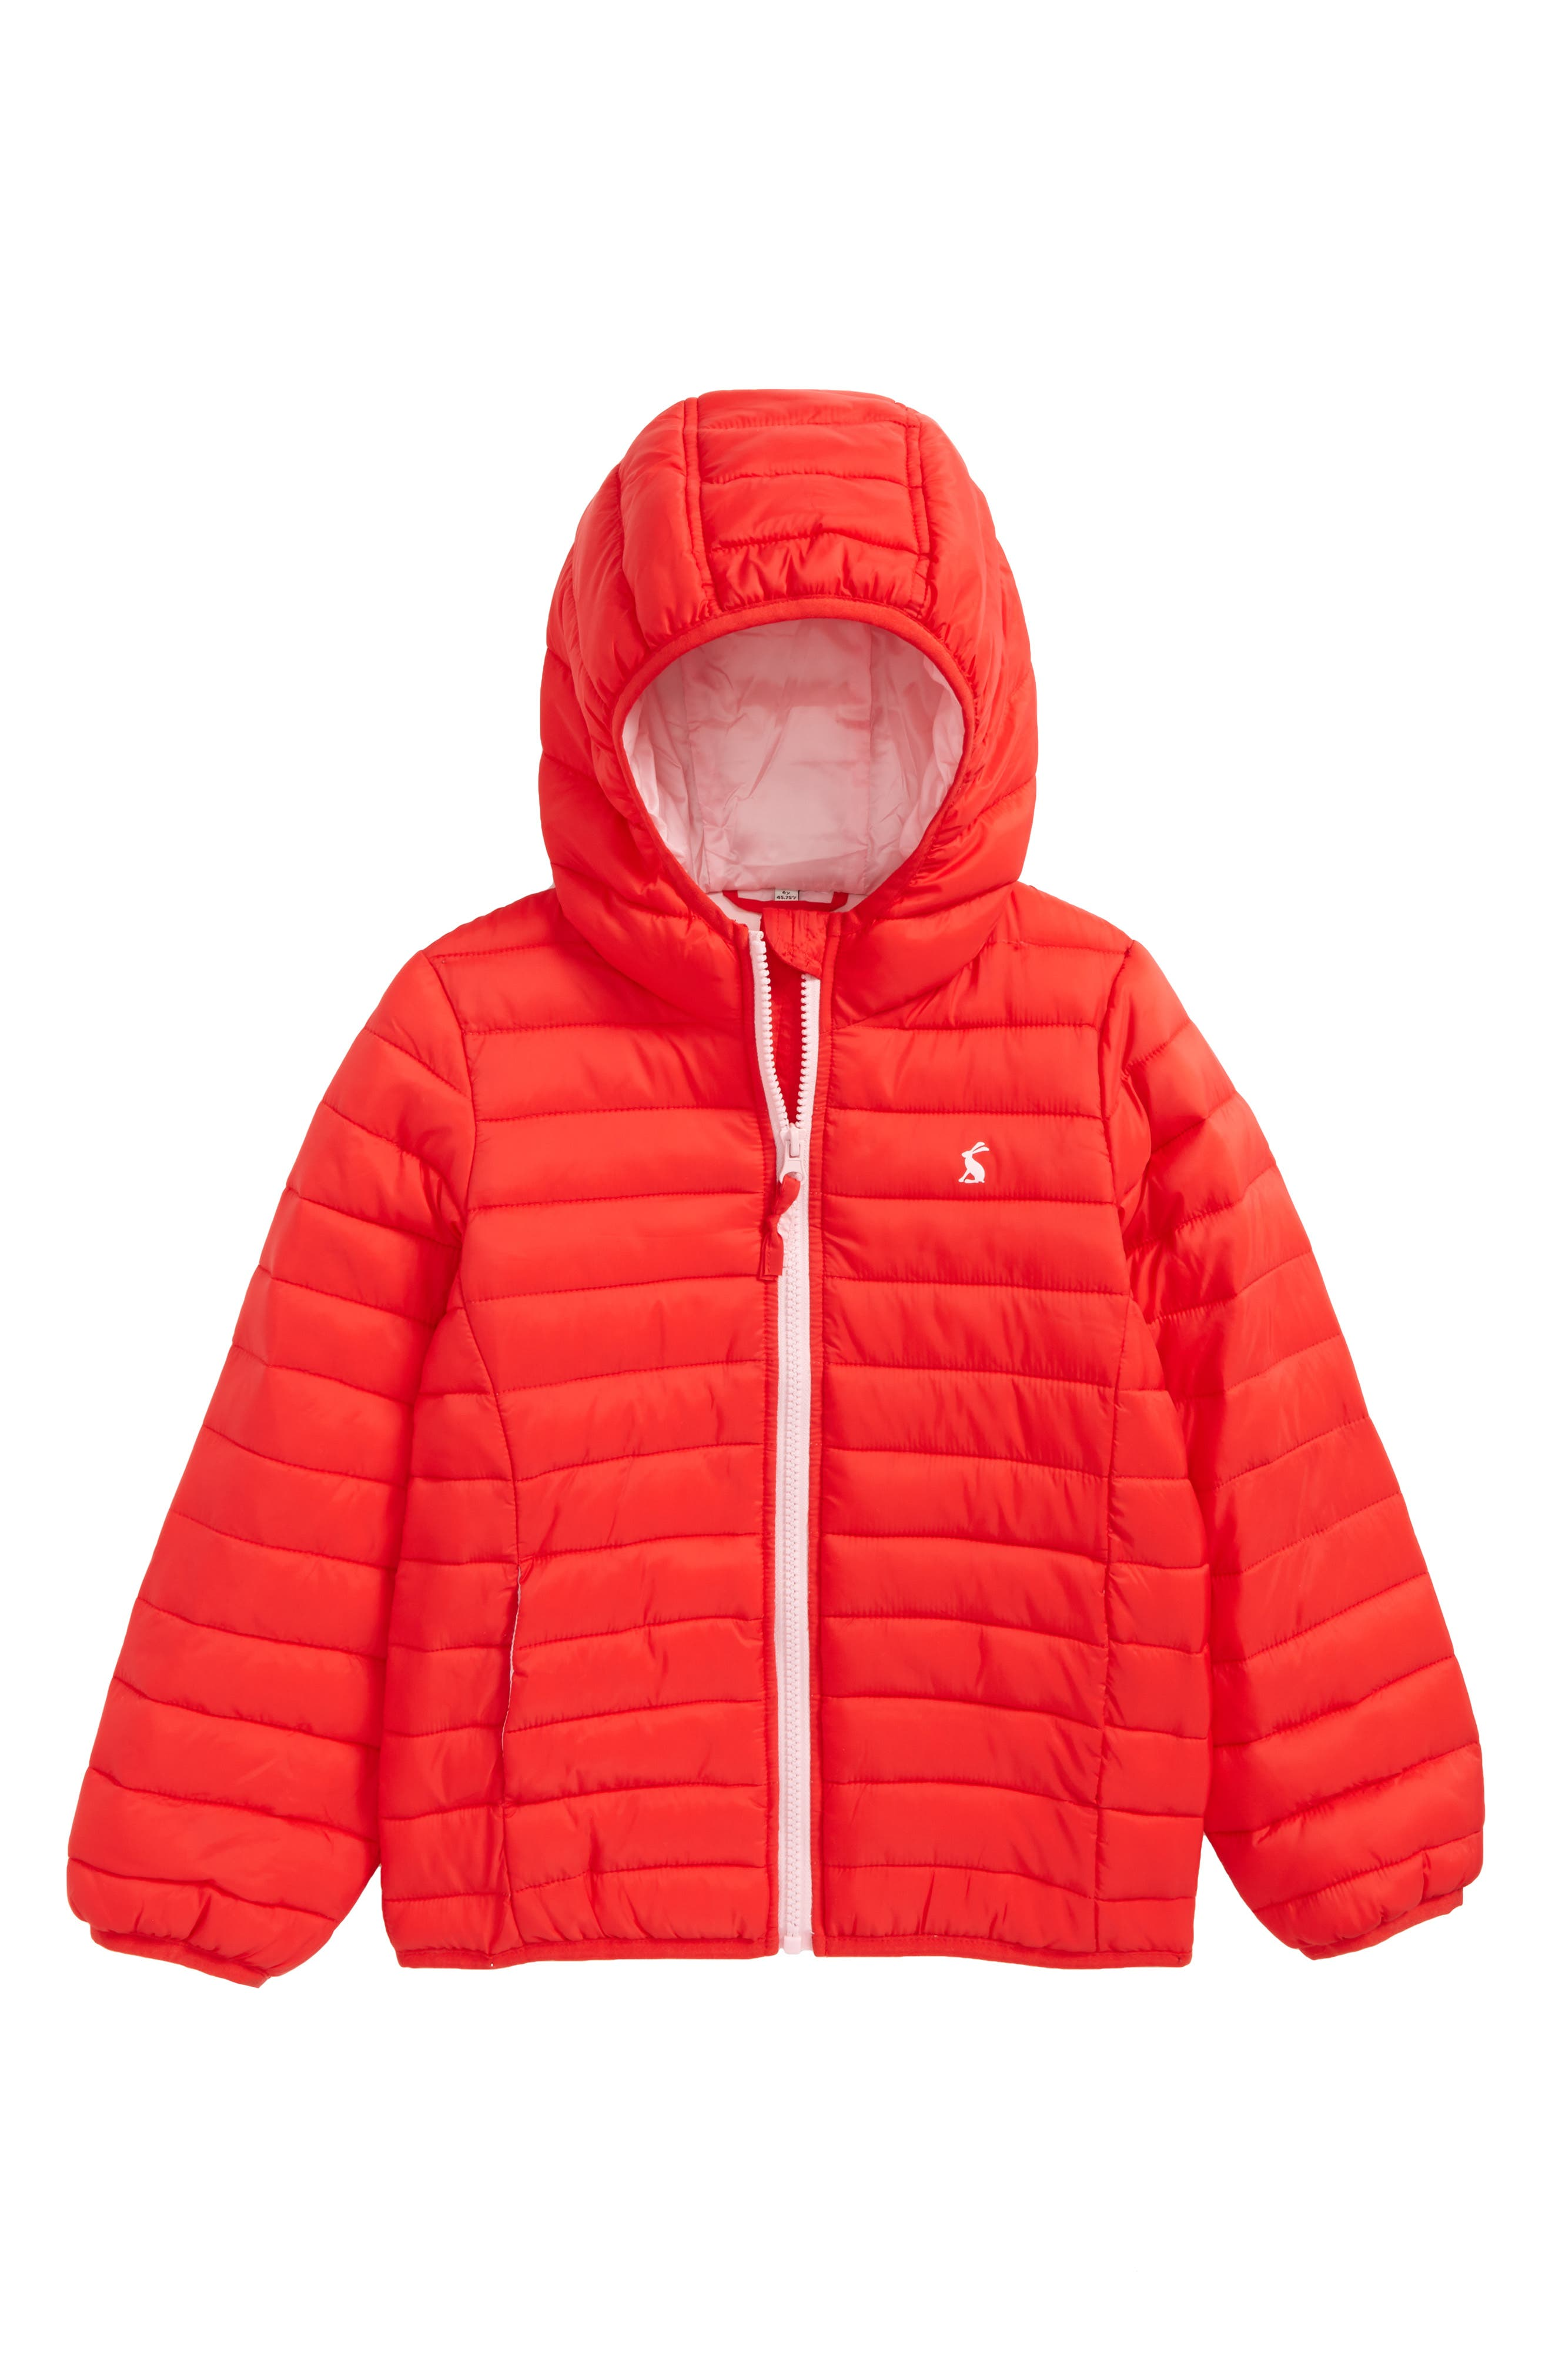 Joules Packaway Hooded Jacket (Toddler Girls, Little Girls & Big Girls)